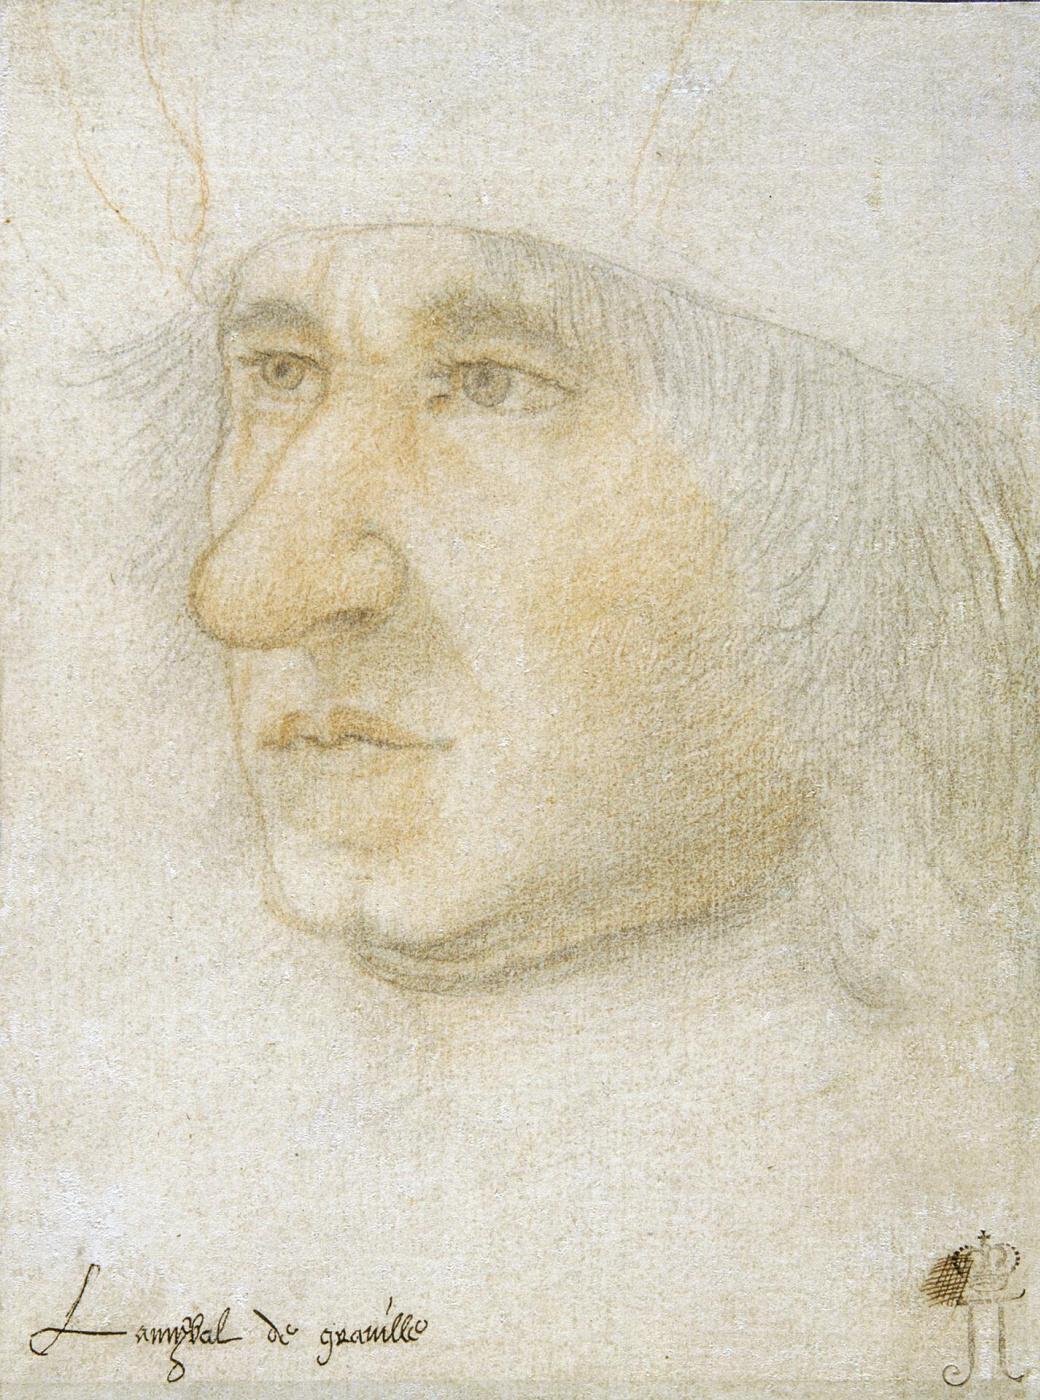 Jean burdishon. Portrait of Admiral de Gravil.